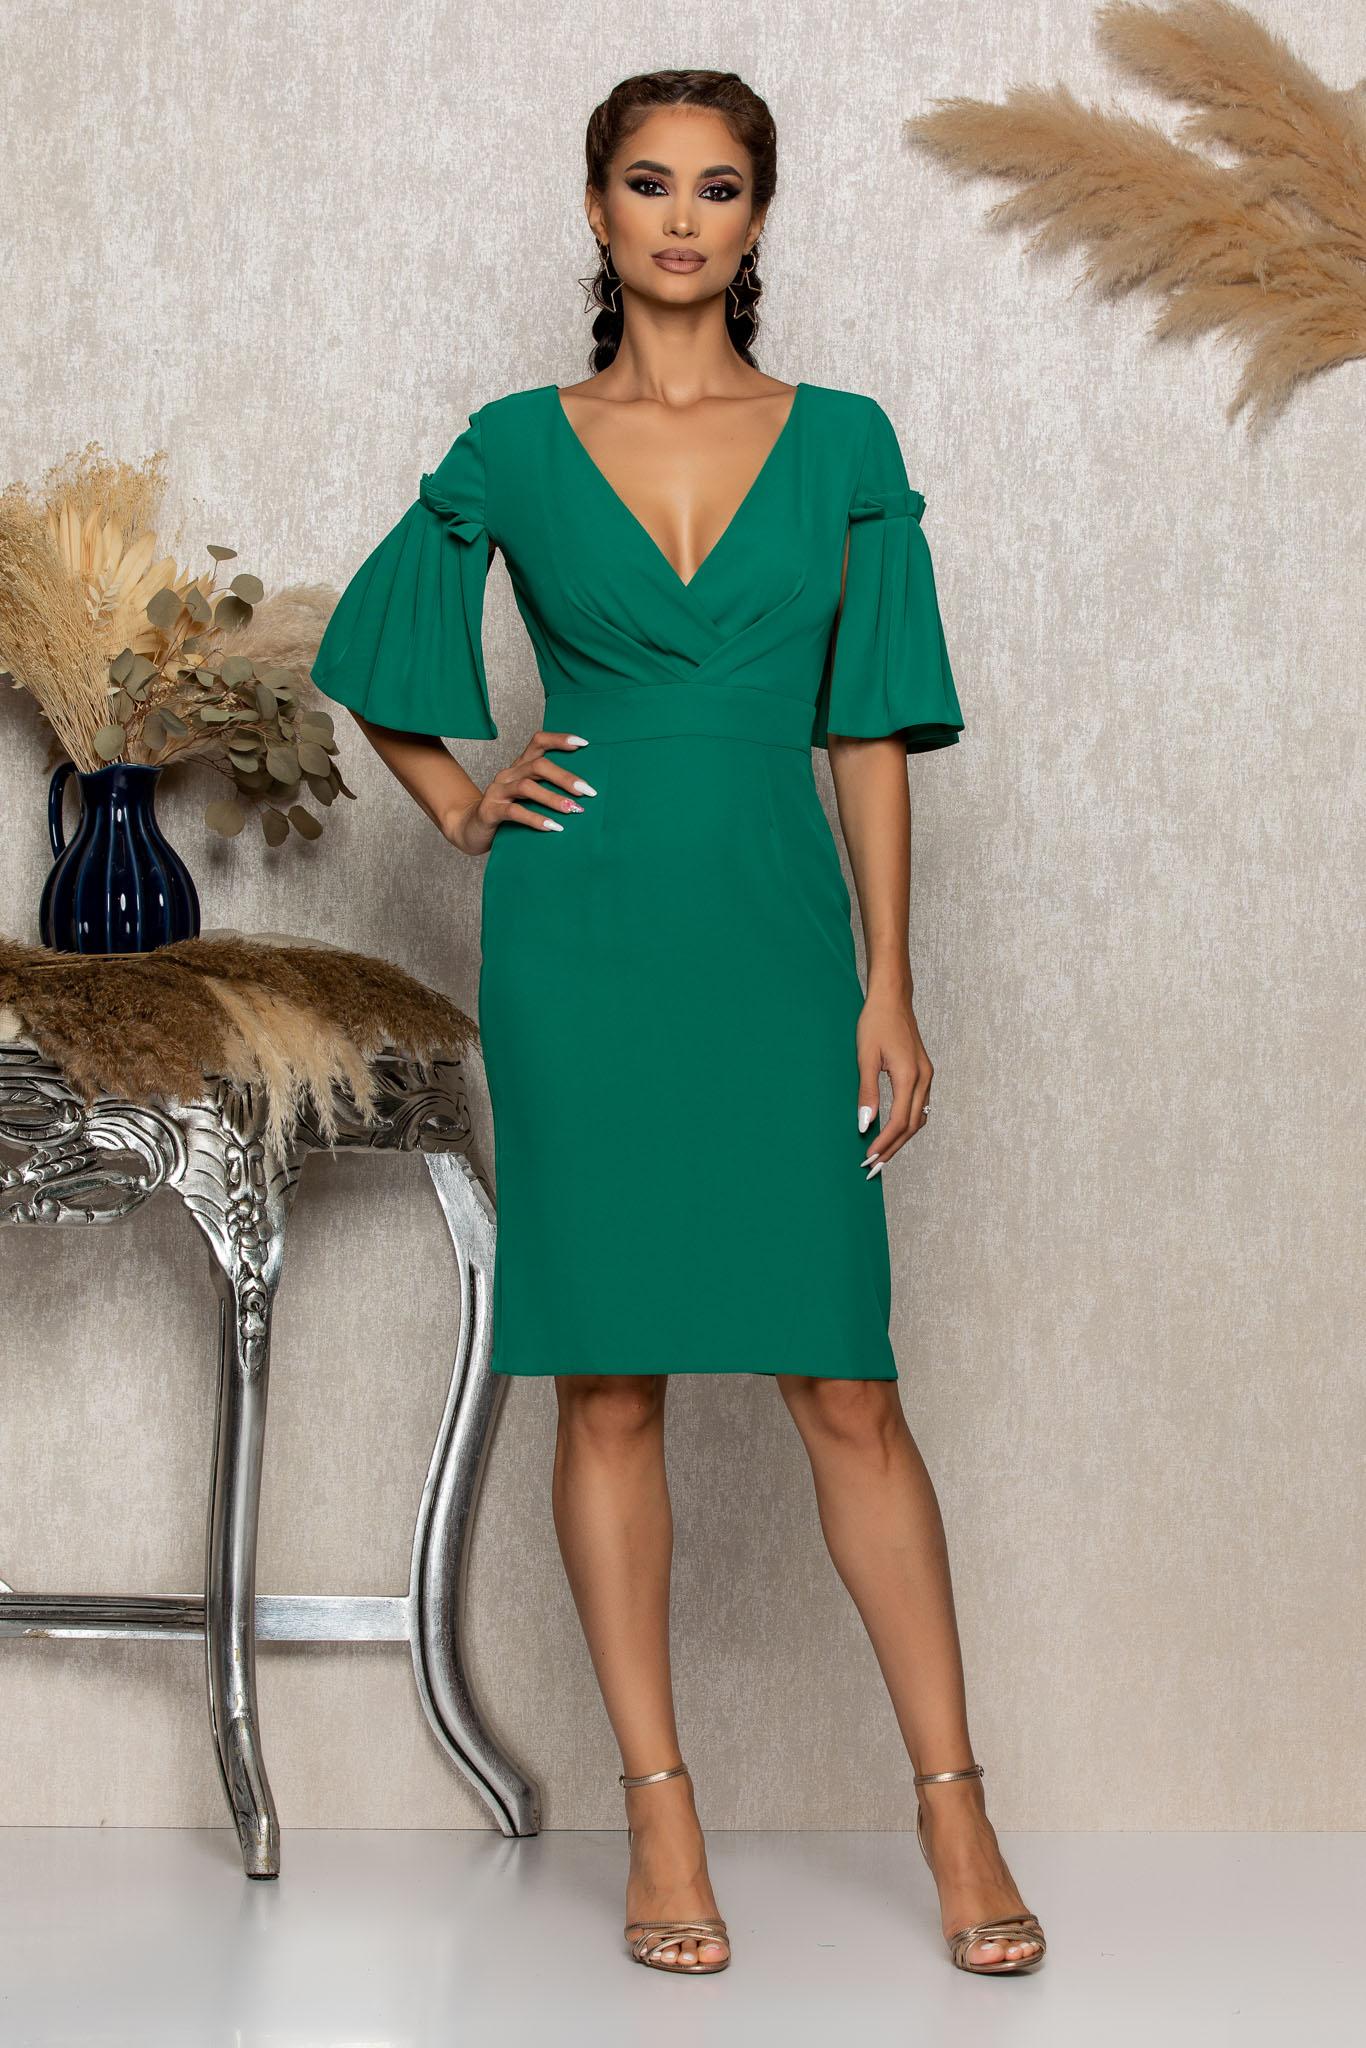 Rochie Moze Verra Verde Marimi Mari S (36) | M (38) | L (40) | XL (42) | XXL (44) | 3XL (46)